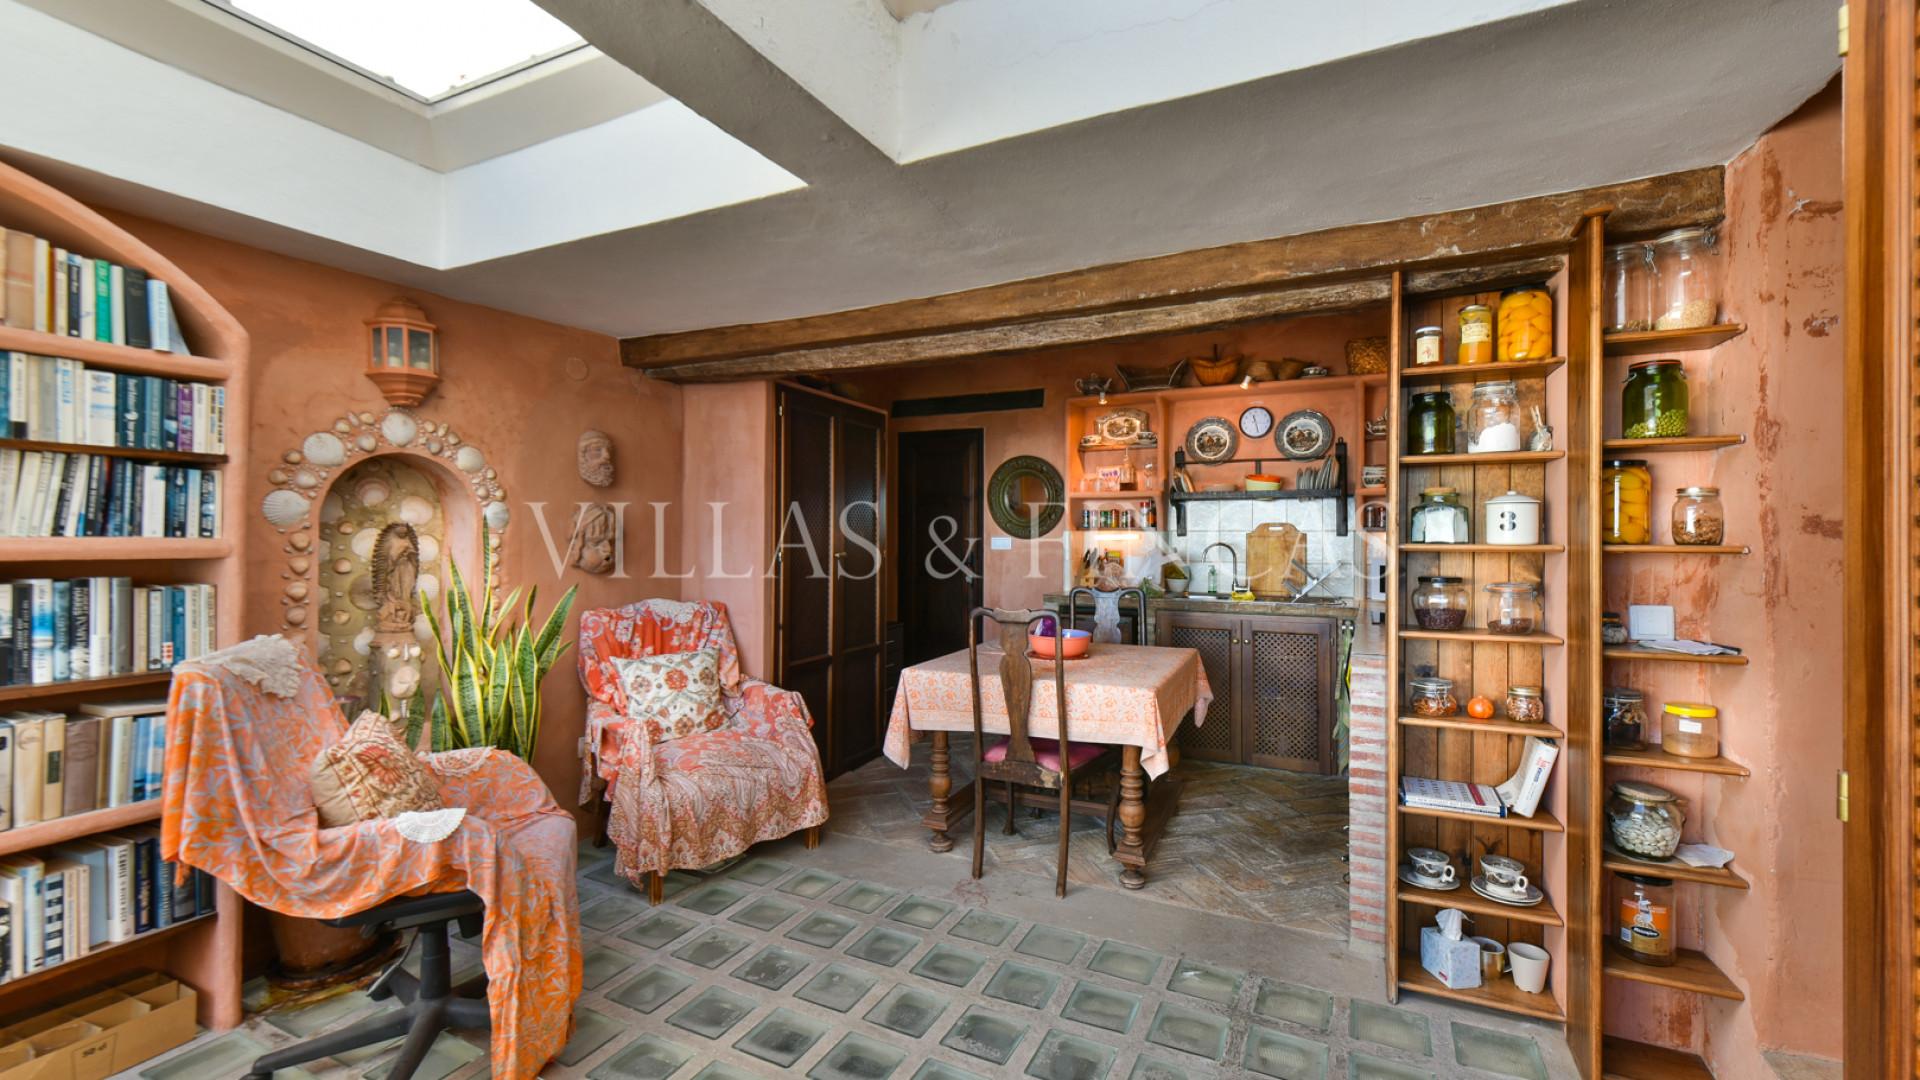 House for sale in Gaucin